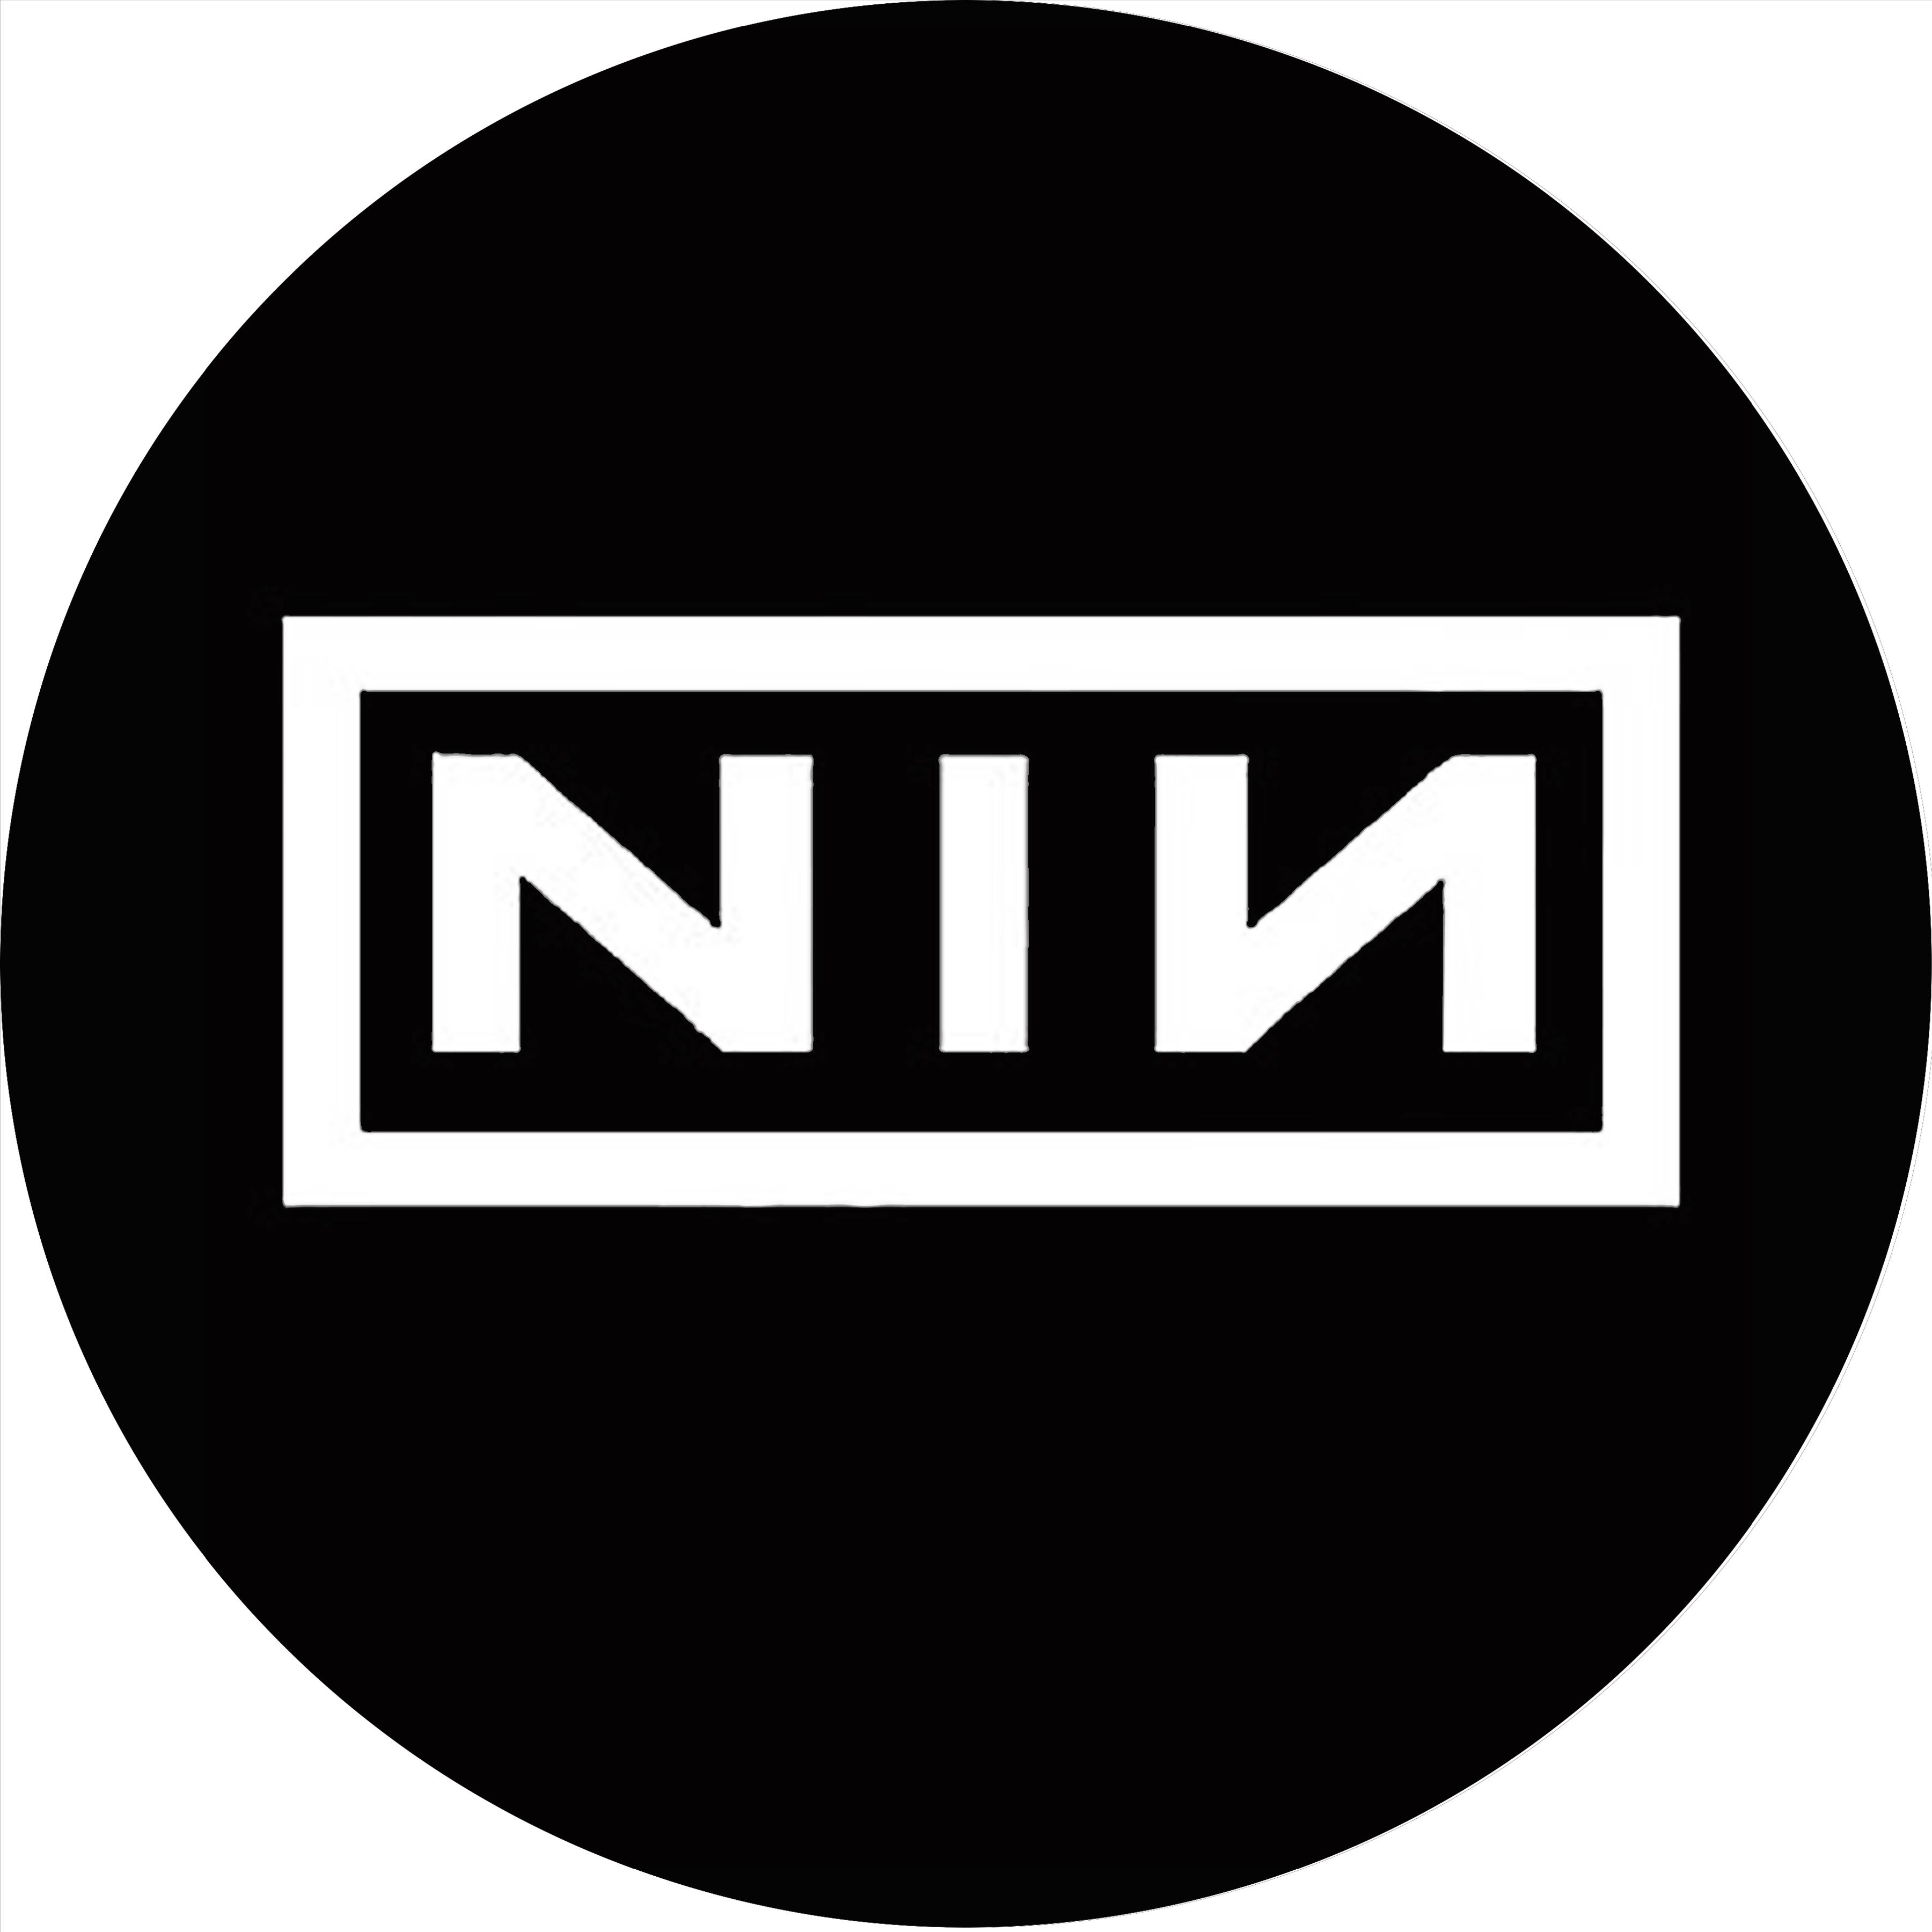 Nine Inch Nails/LOGO SLIPMAT